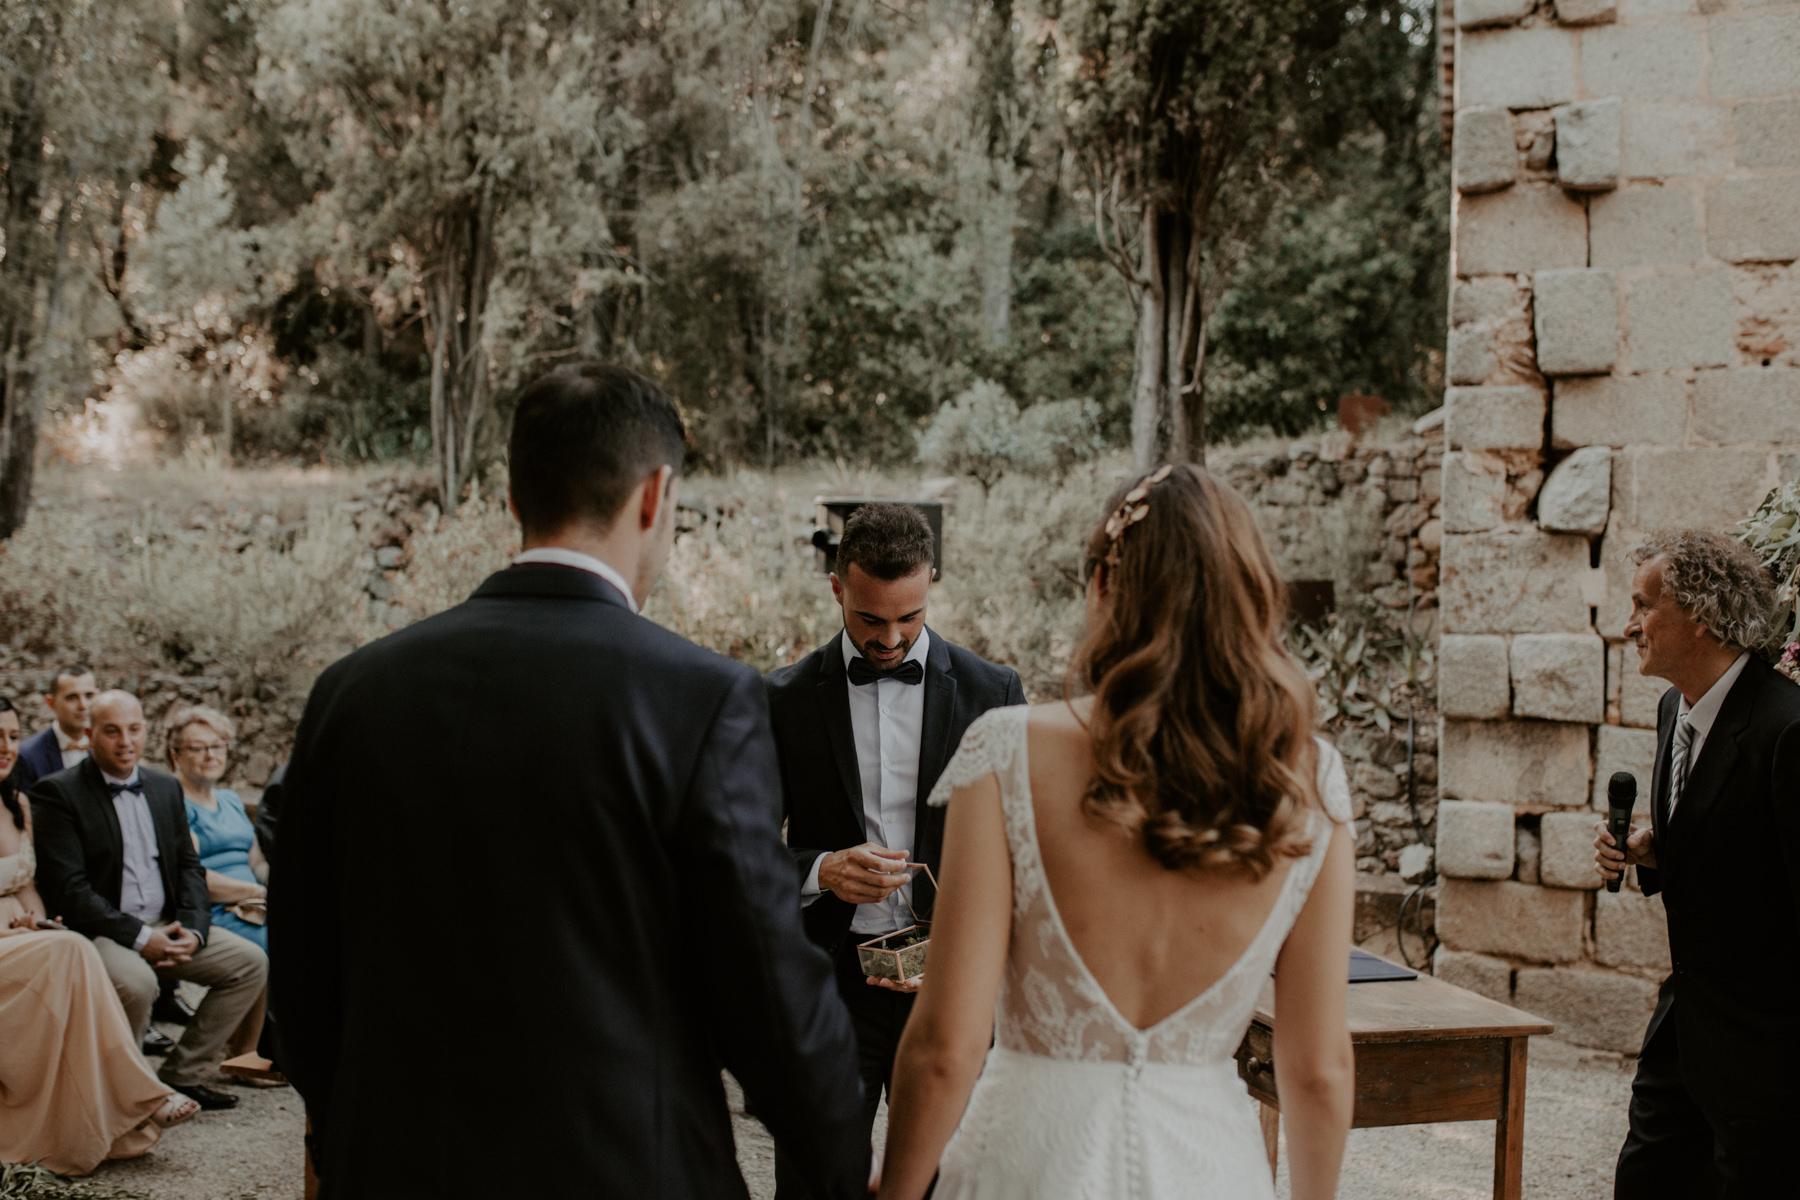 alt_thenortherngirlphotography_couples_weddingphotographer_photographer_wedding_boda_fotografodebodas_fotografobodasbarcelona_bodaindie_bodasconestilo_bodaensantperedeclara_jennifermiguel-353.jpg